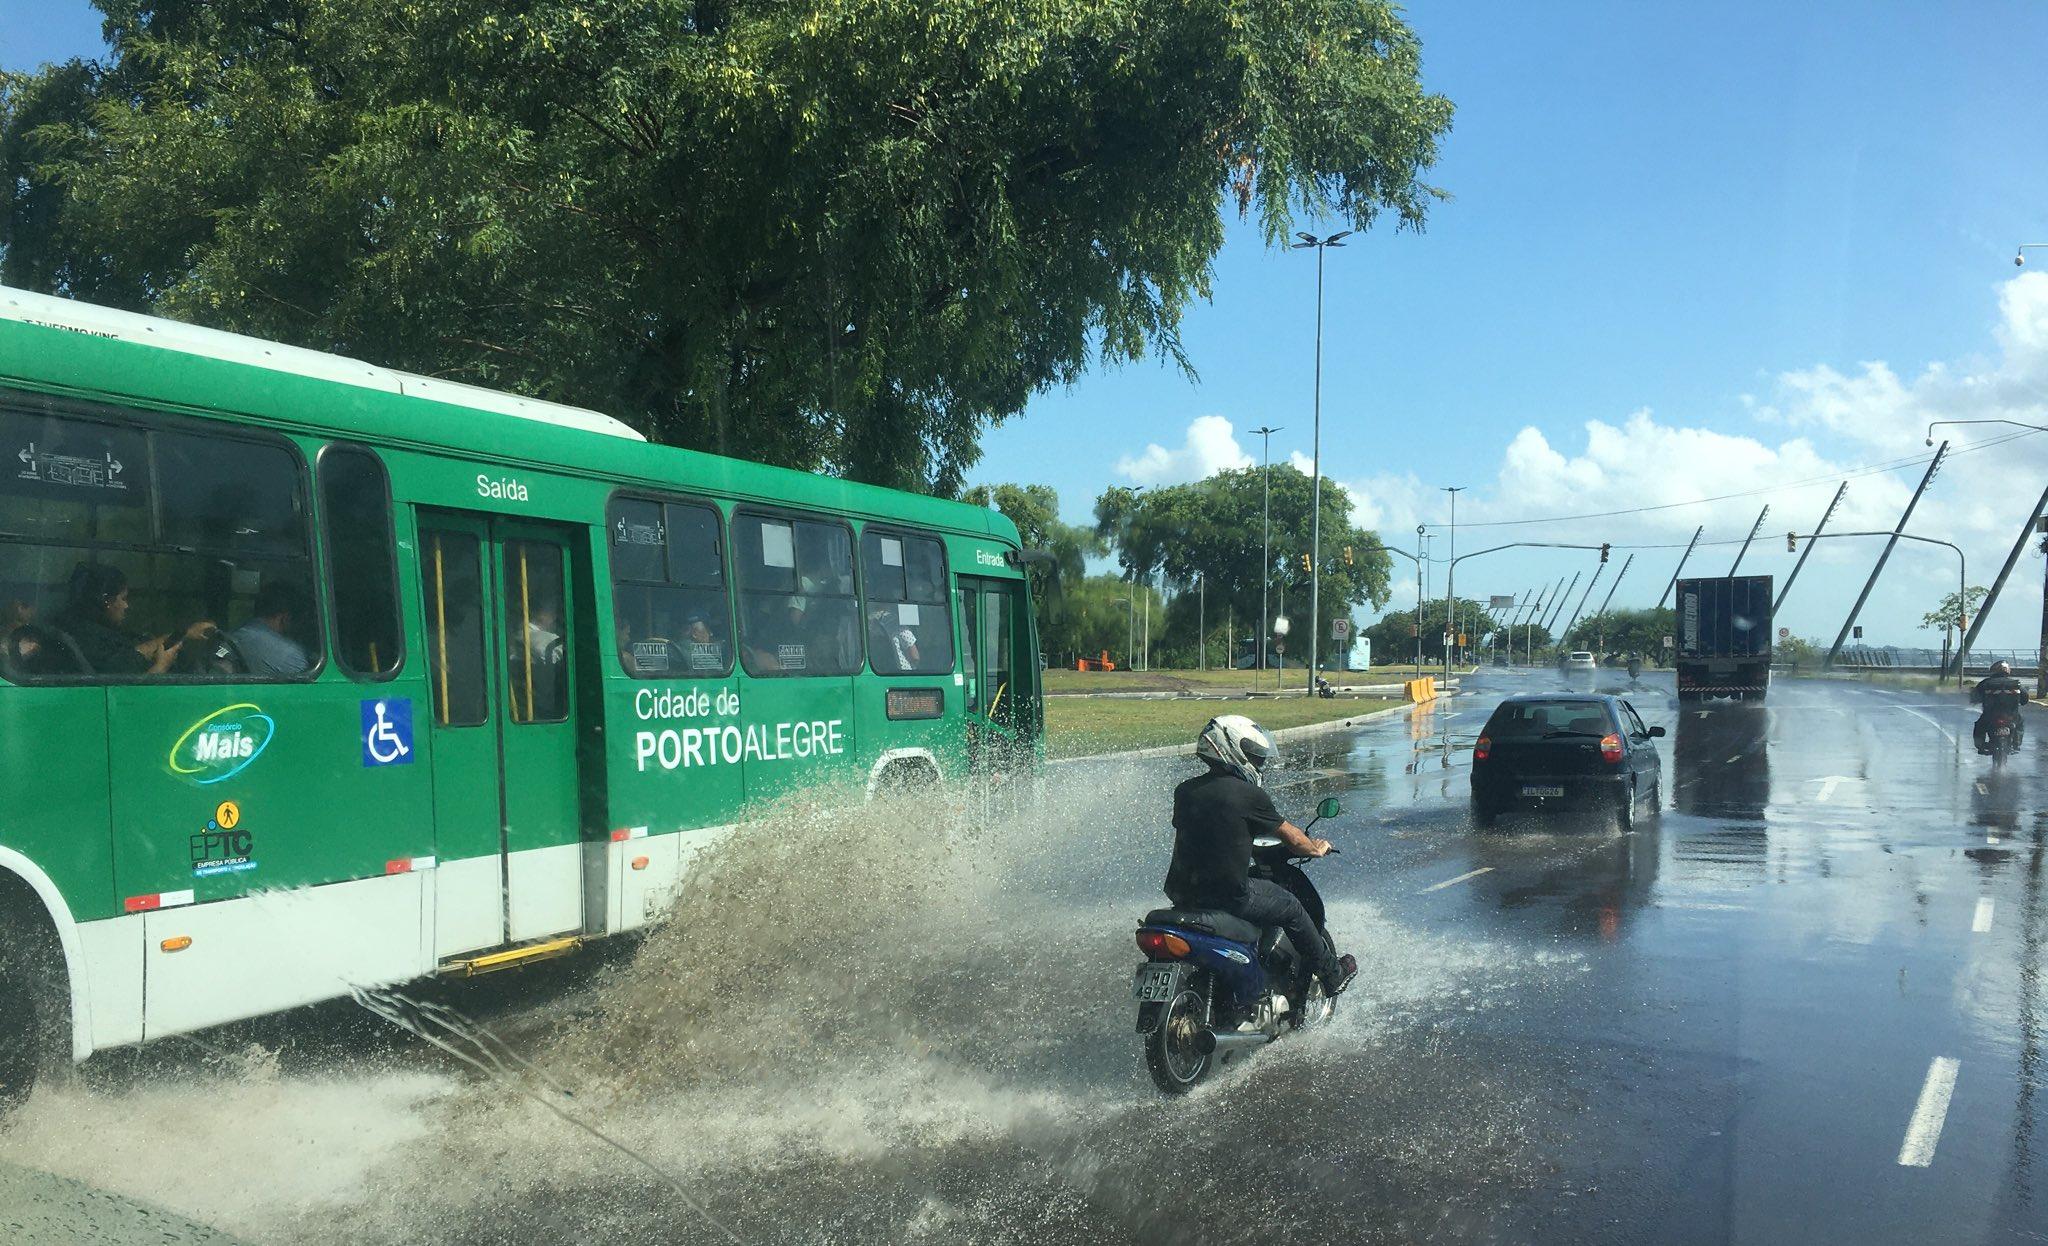 Avenida Presidente João Goulart